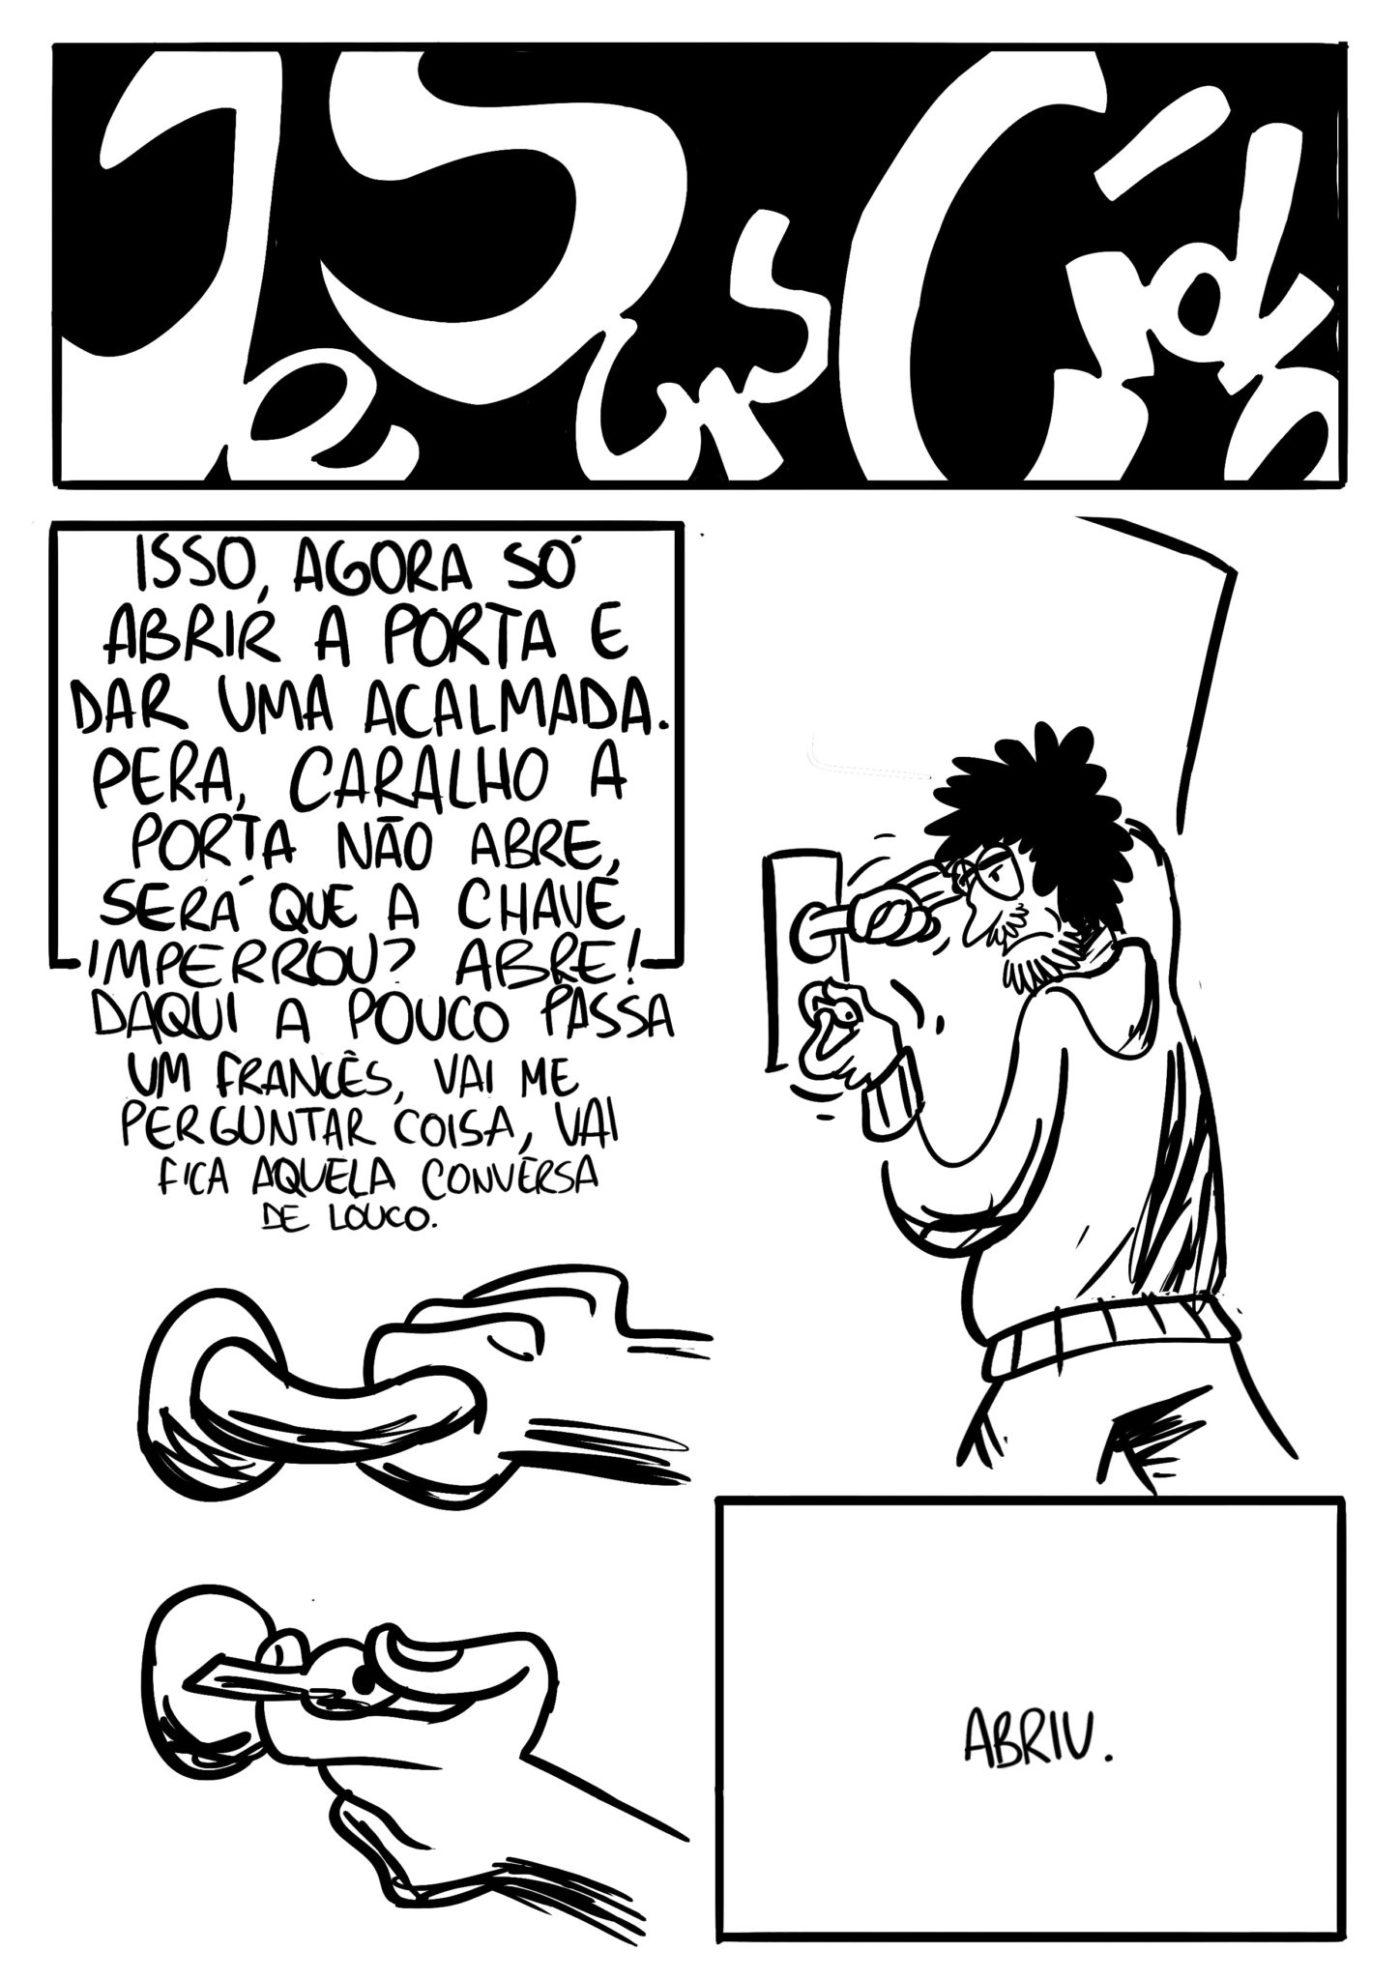 Je Suis Cídio #11, por João B. Godoi